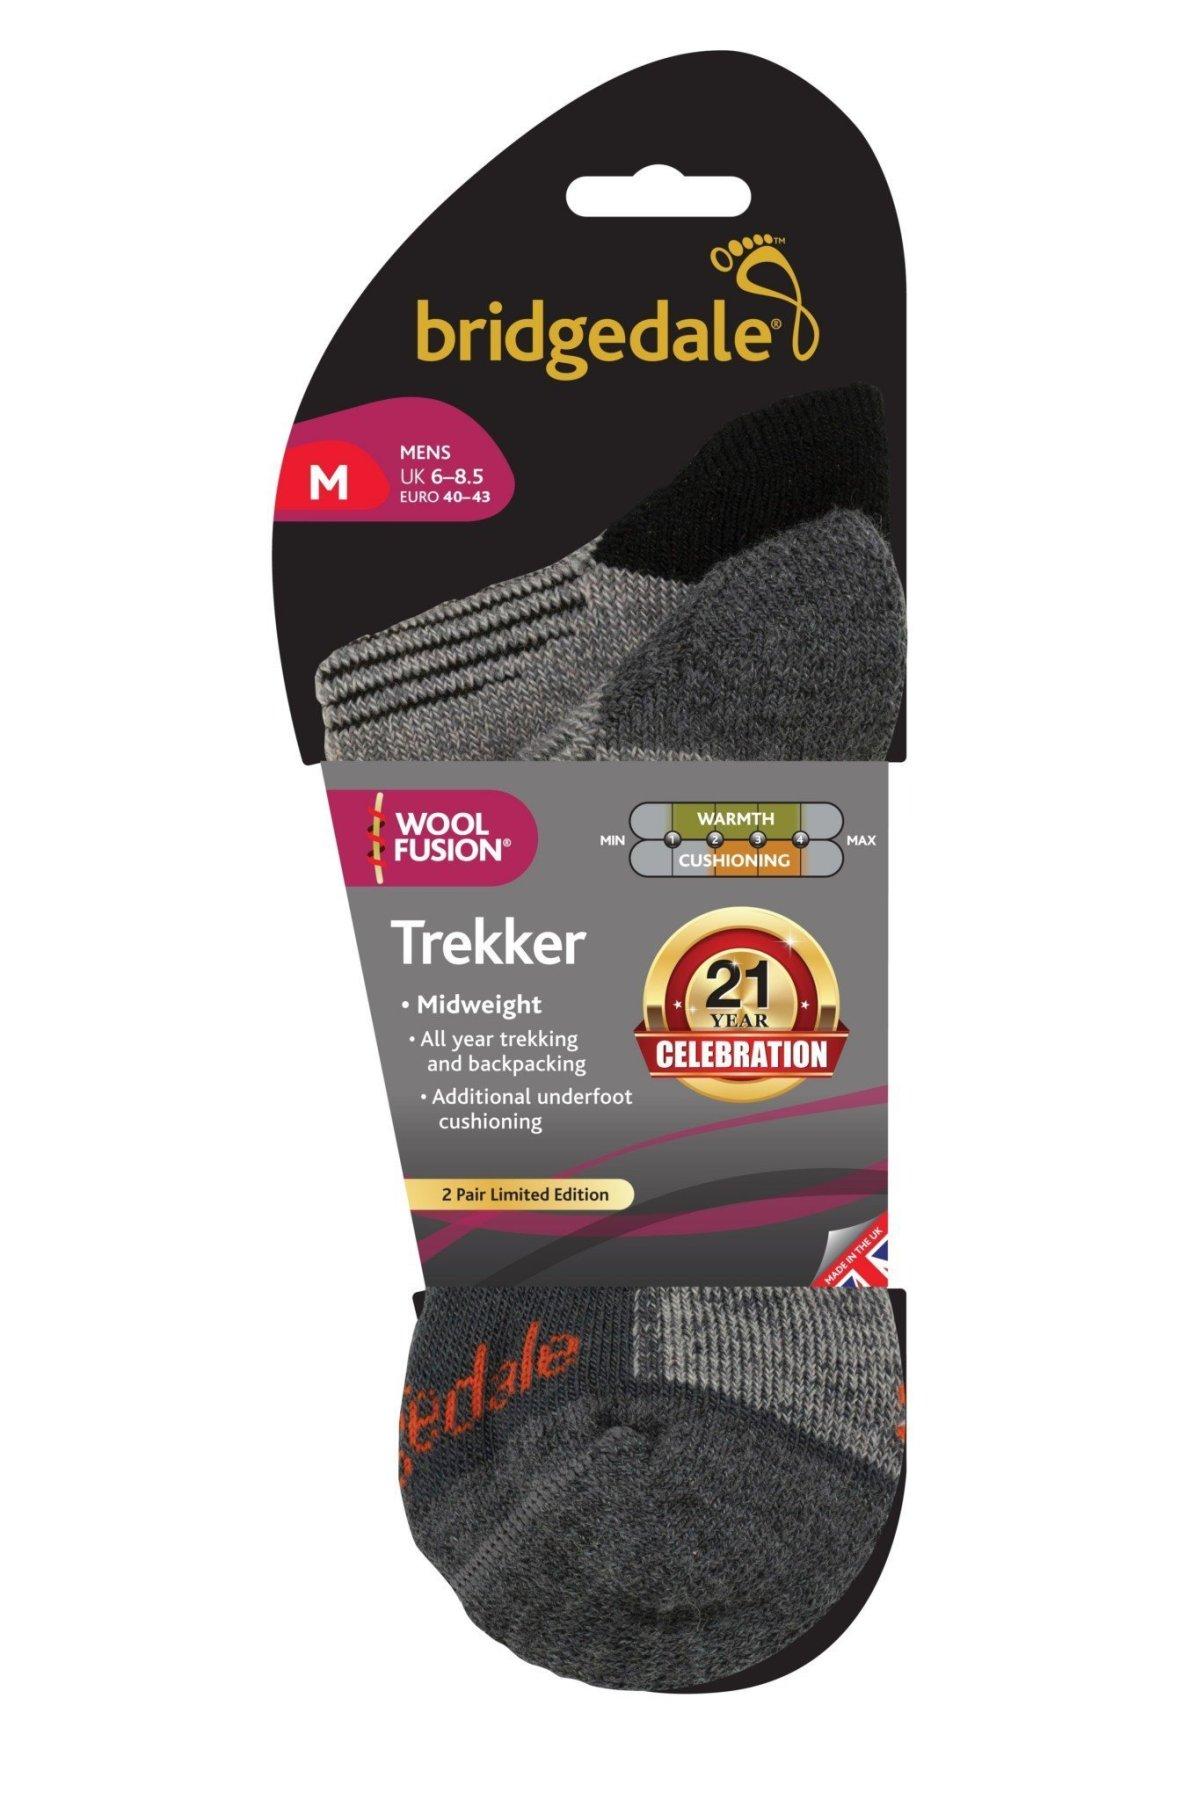 Bridgedale Trekker celebrates it's 21st birthday